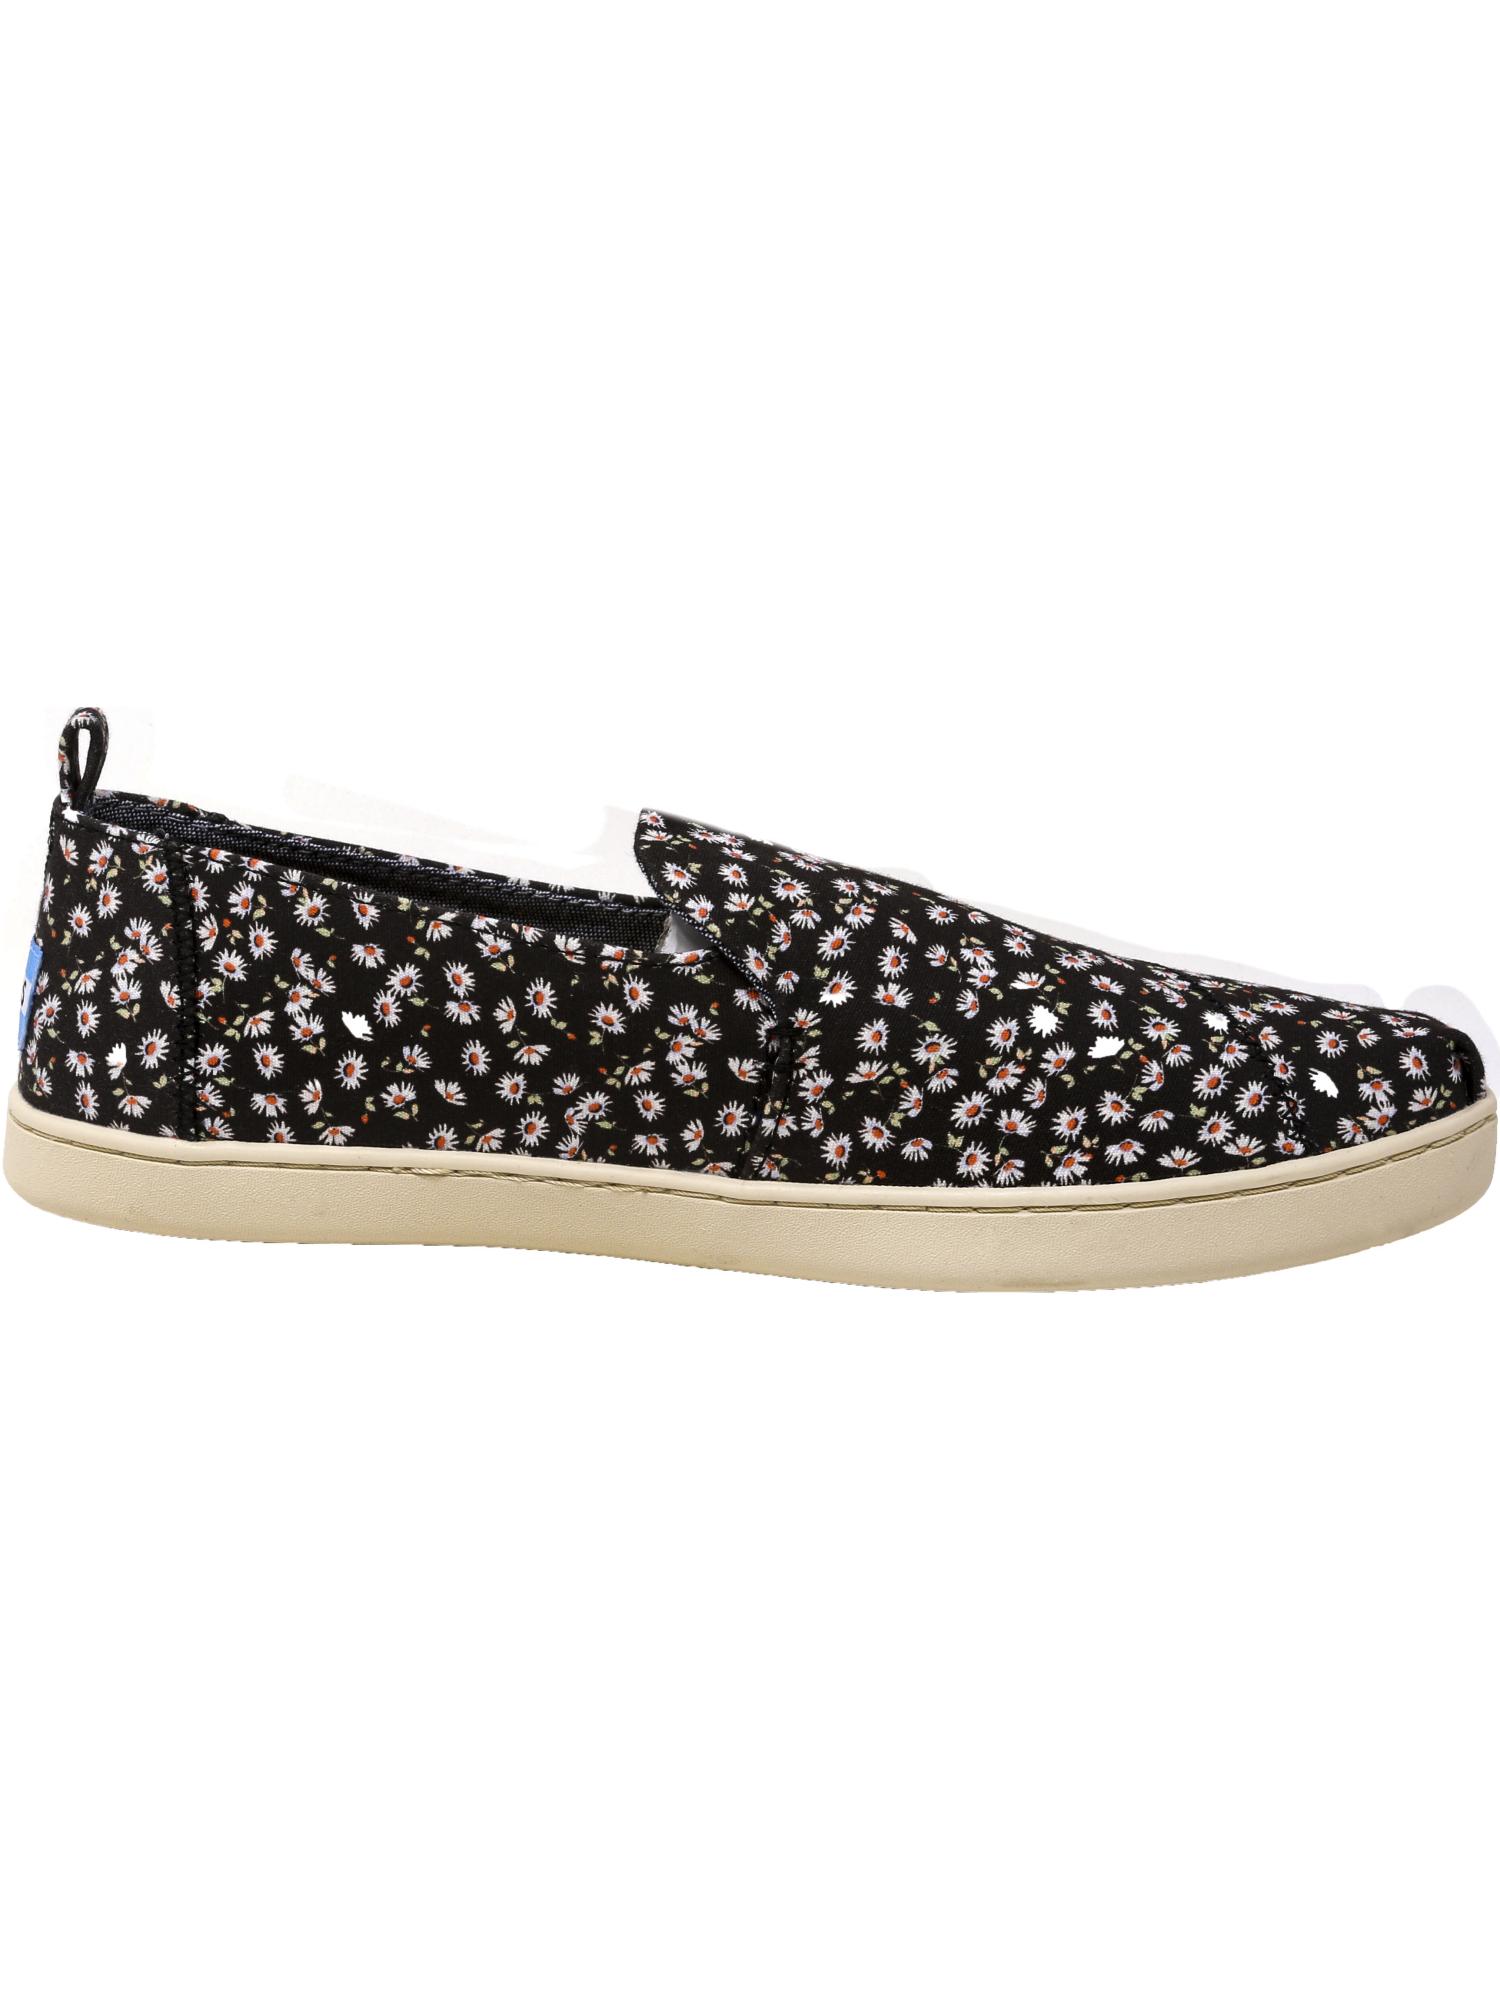 Toms-Women-039-s-Deconstructed-Alpargata-Canvas-Ankle-High-Slip-On-Shoes thumbnail 6